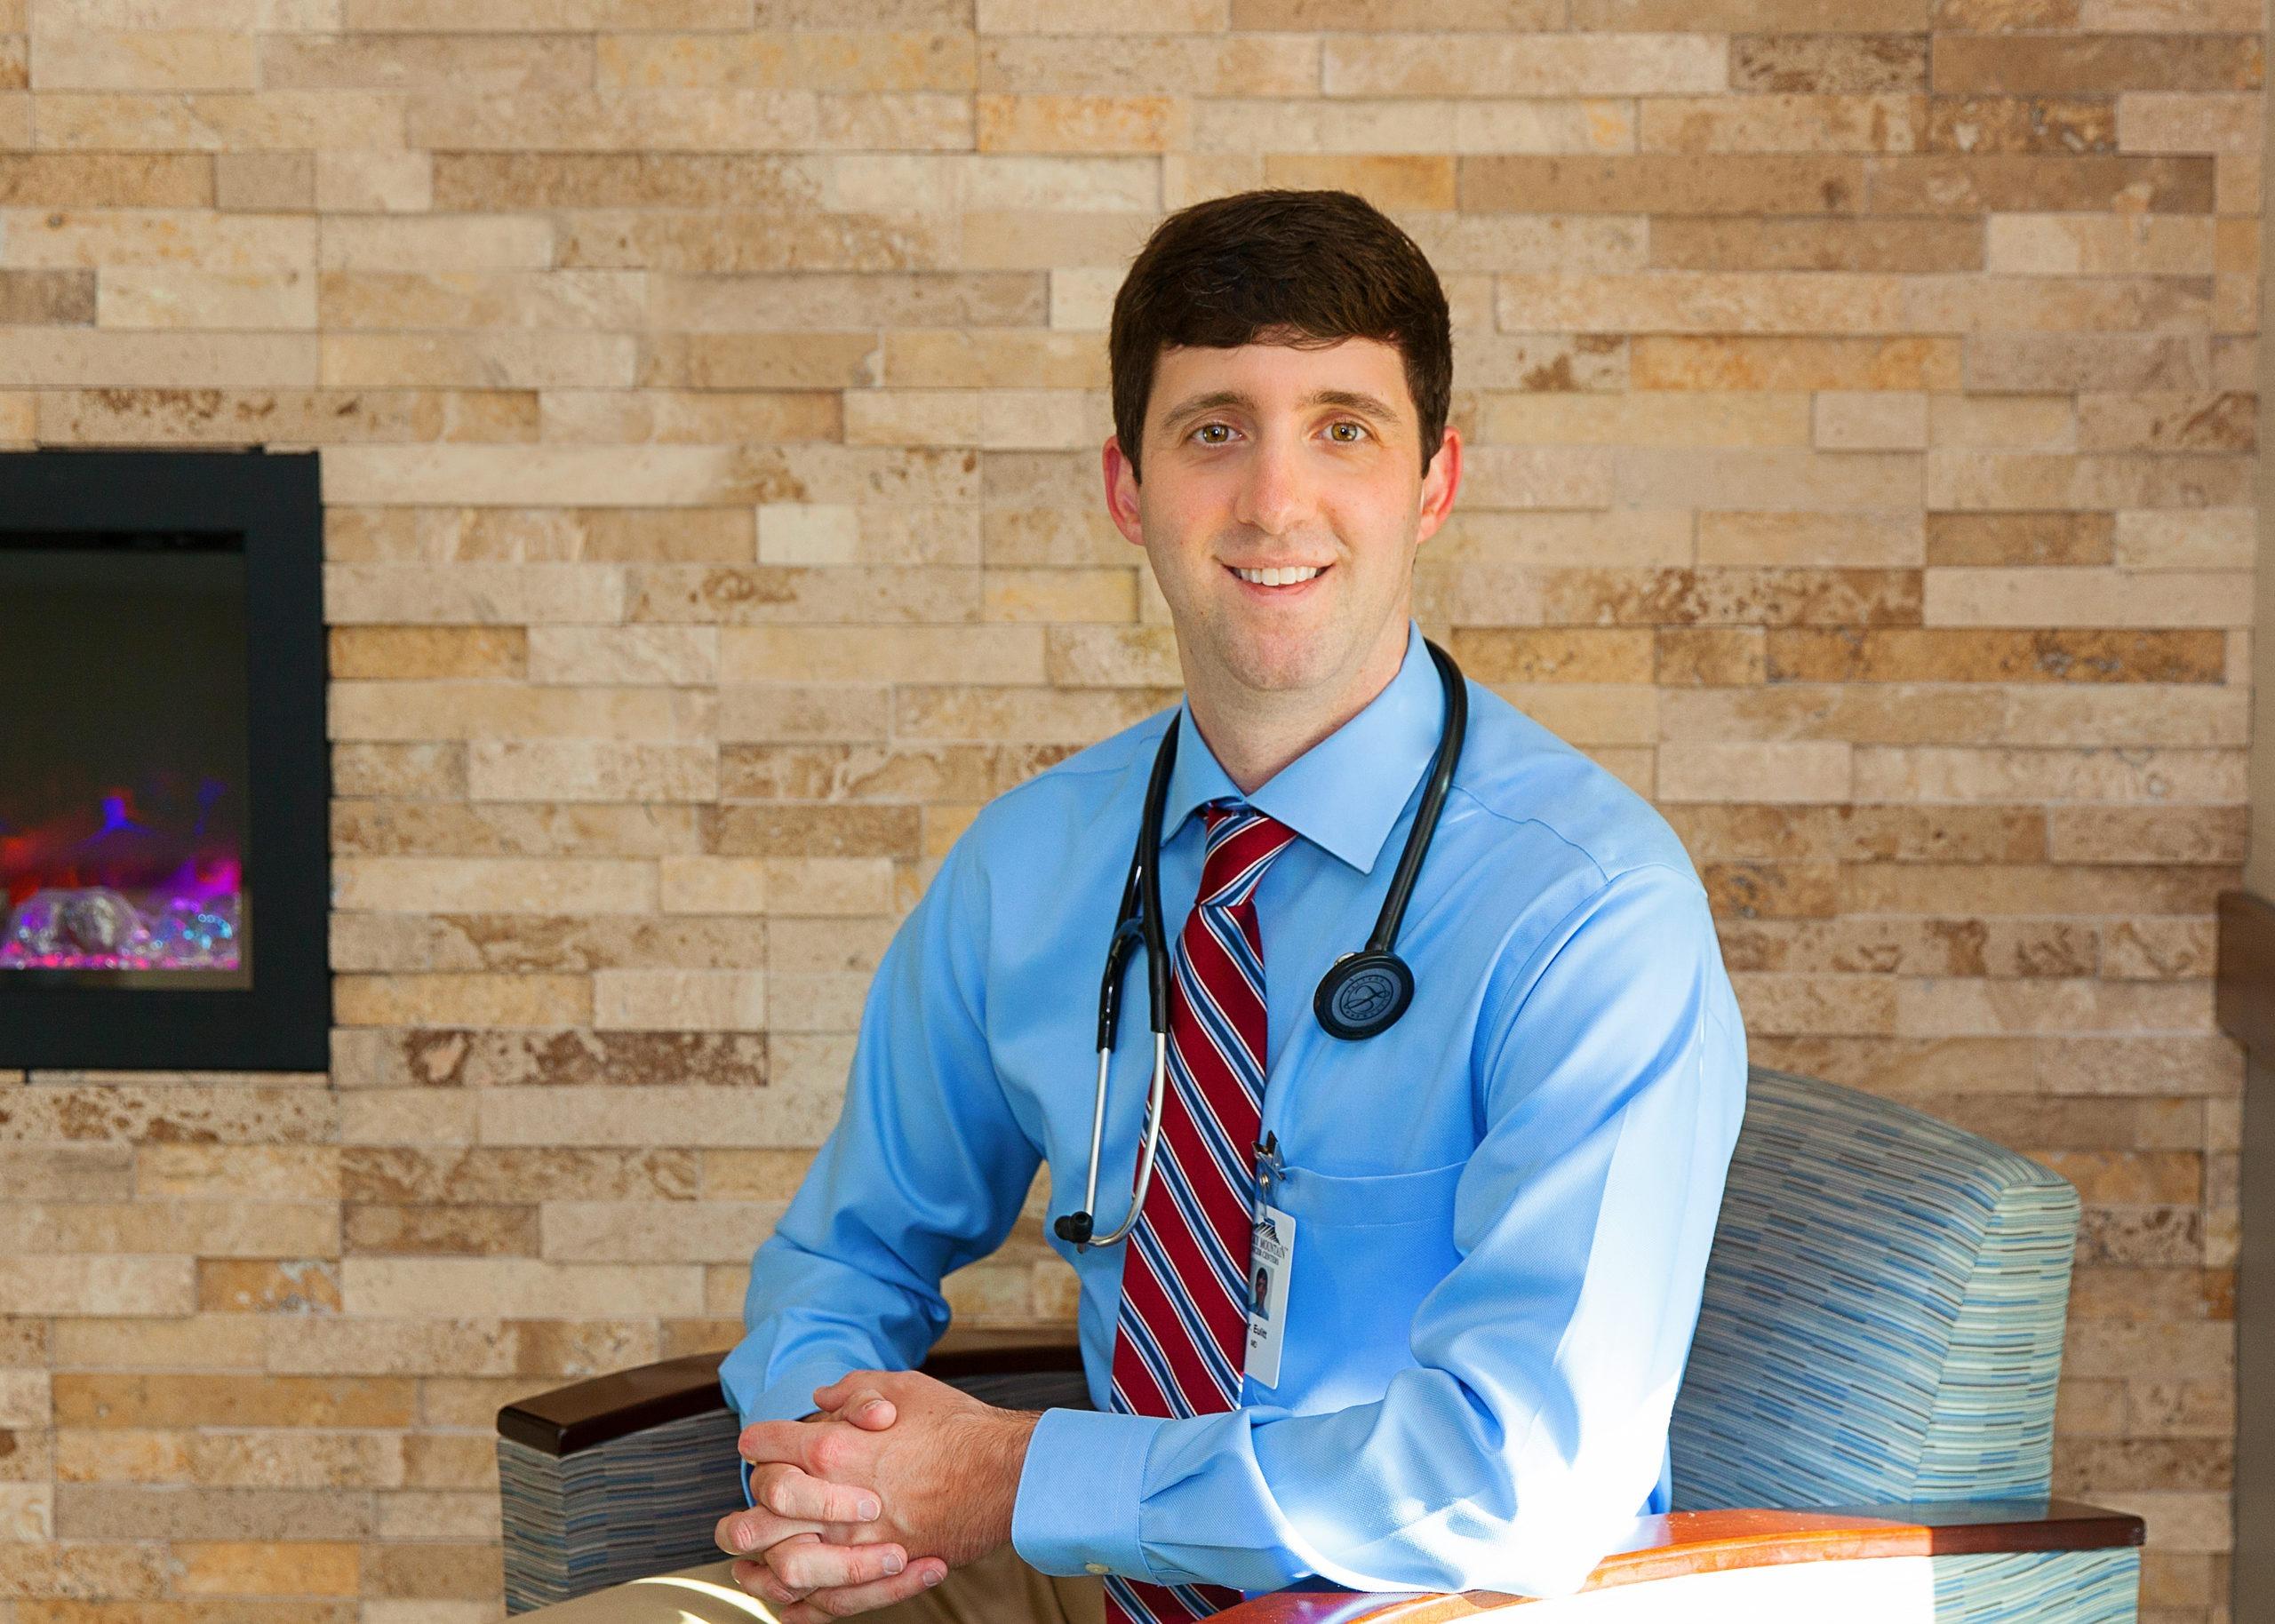 Dr. Patrick Eulitt, Hematologist, Rocky Mountain Cancer Centers, Denver, Colorado